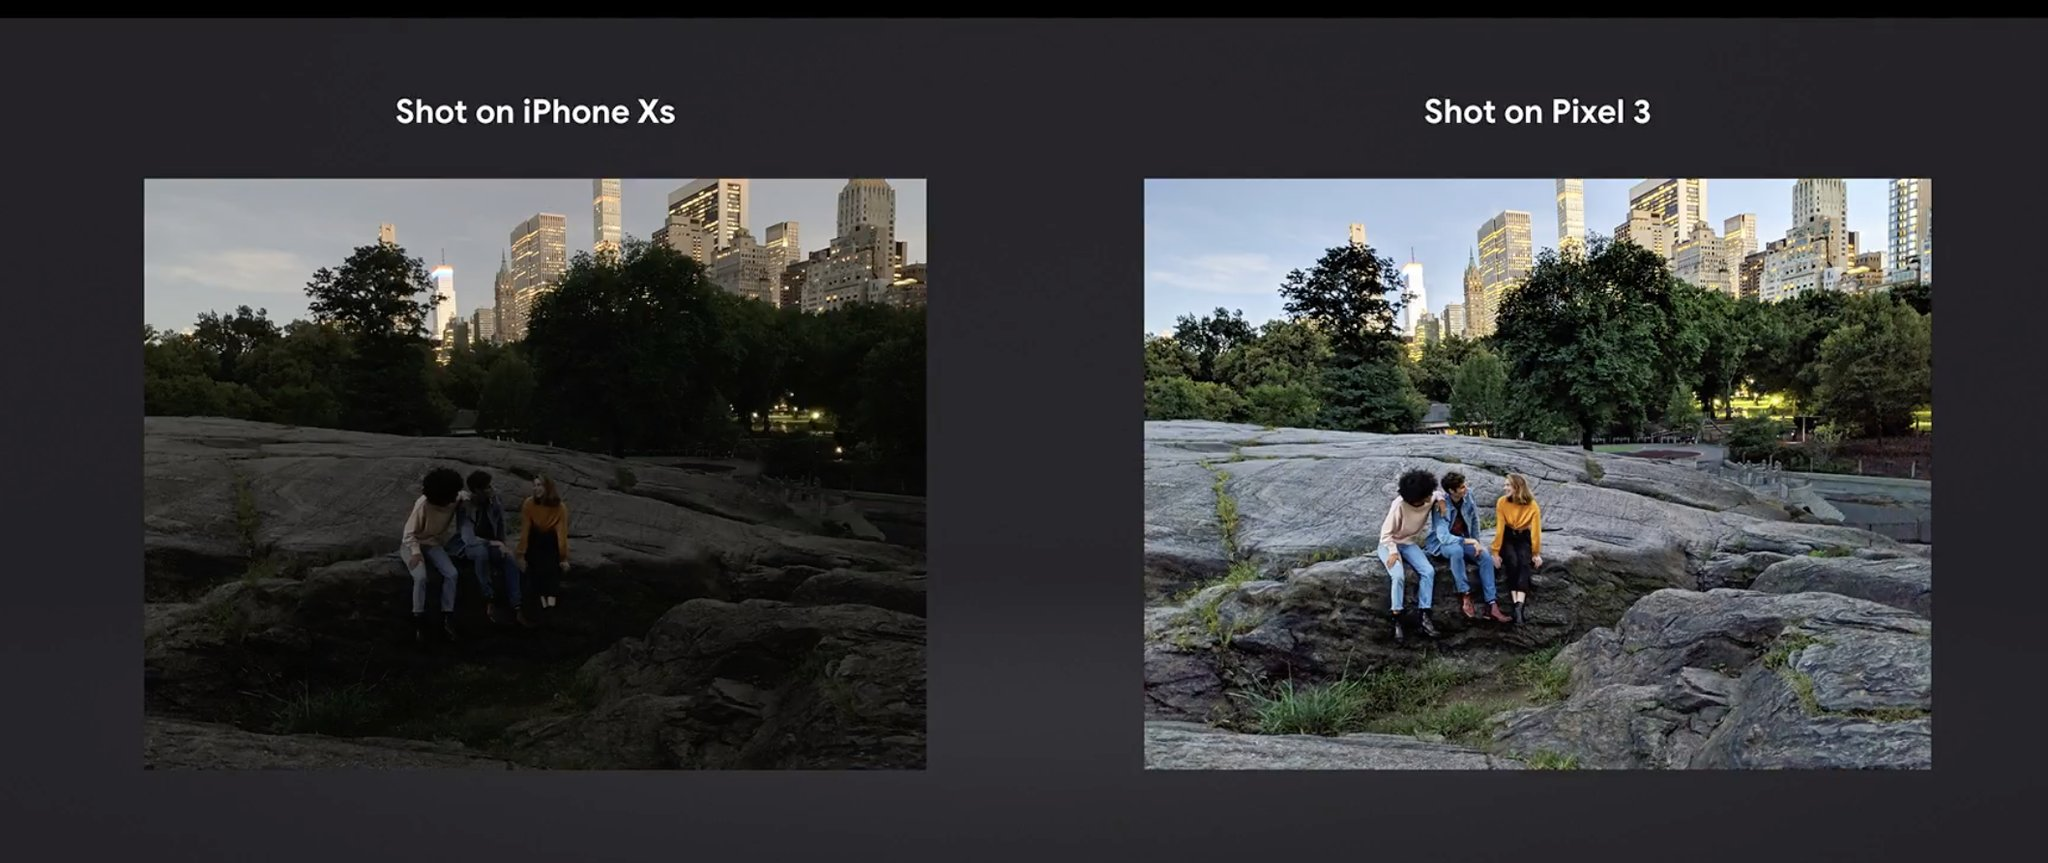 Pixel 3 vs iPhone XS Night Sight